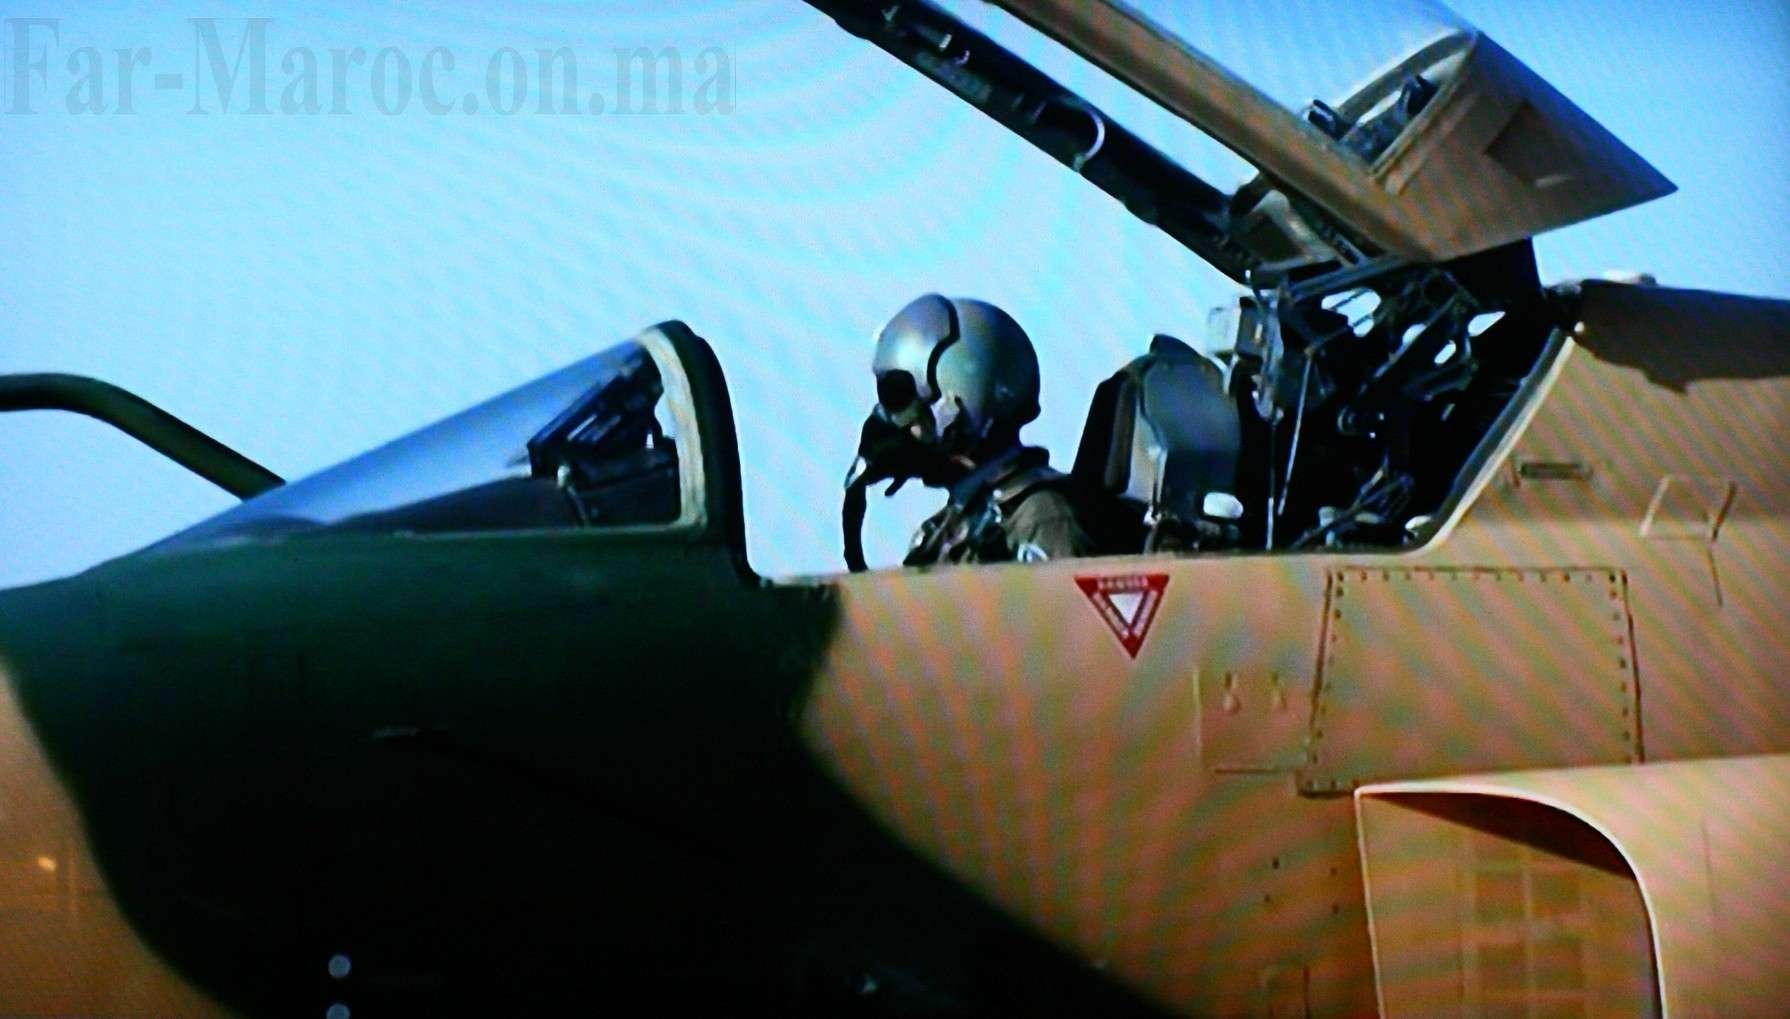 Tenues de vol / Equipements de nos pilotes - Page 3 Img_8610